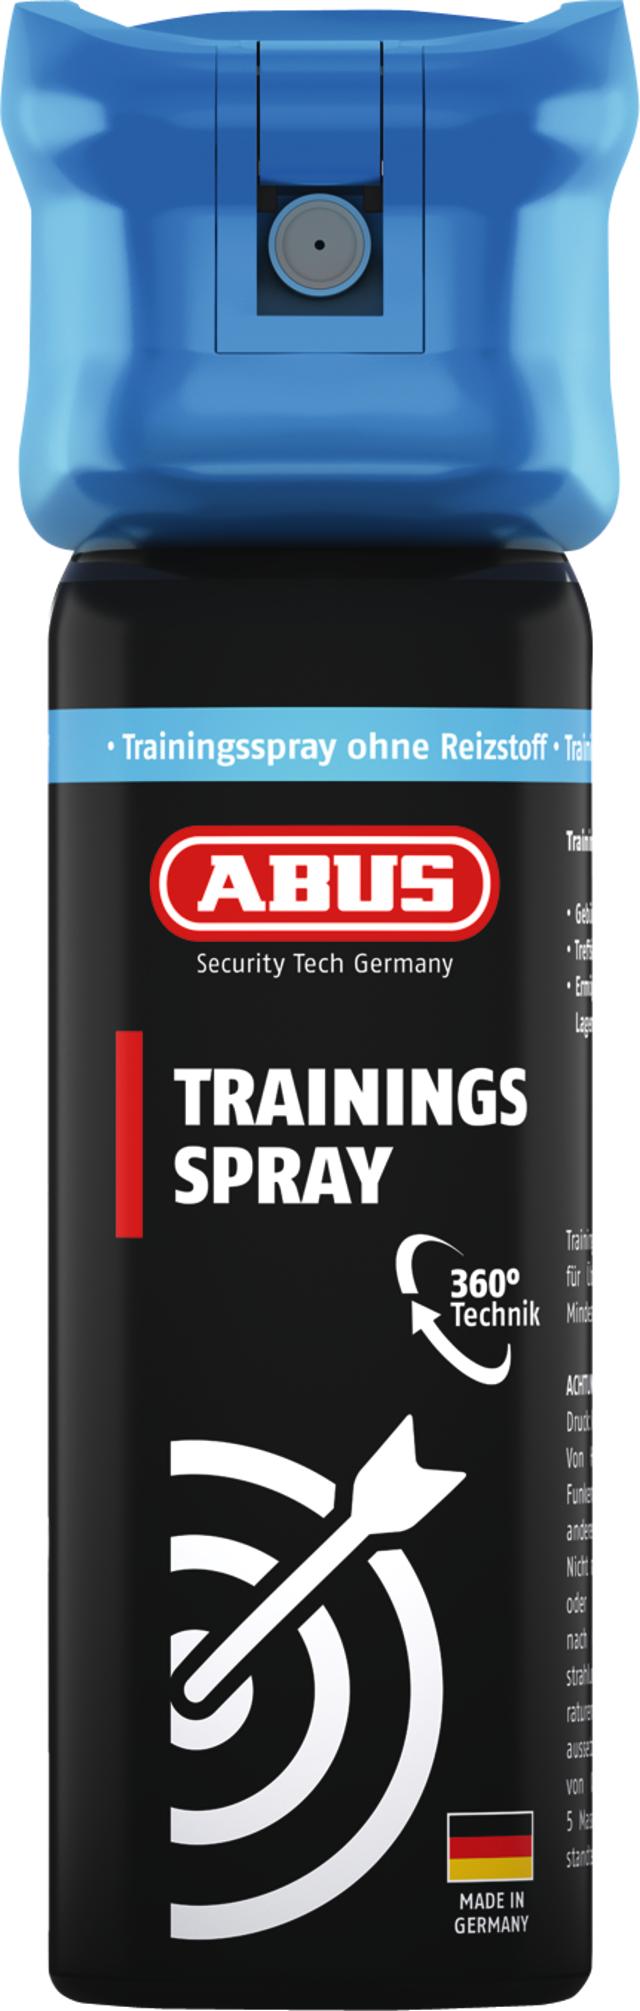 Trainingsspray